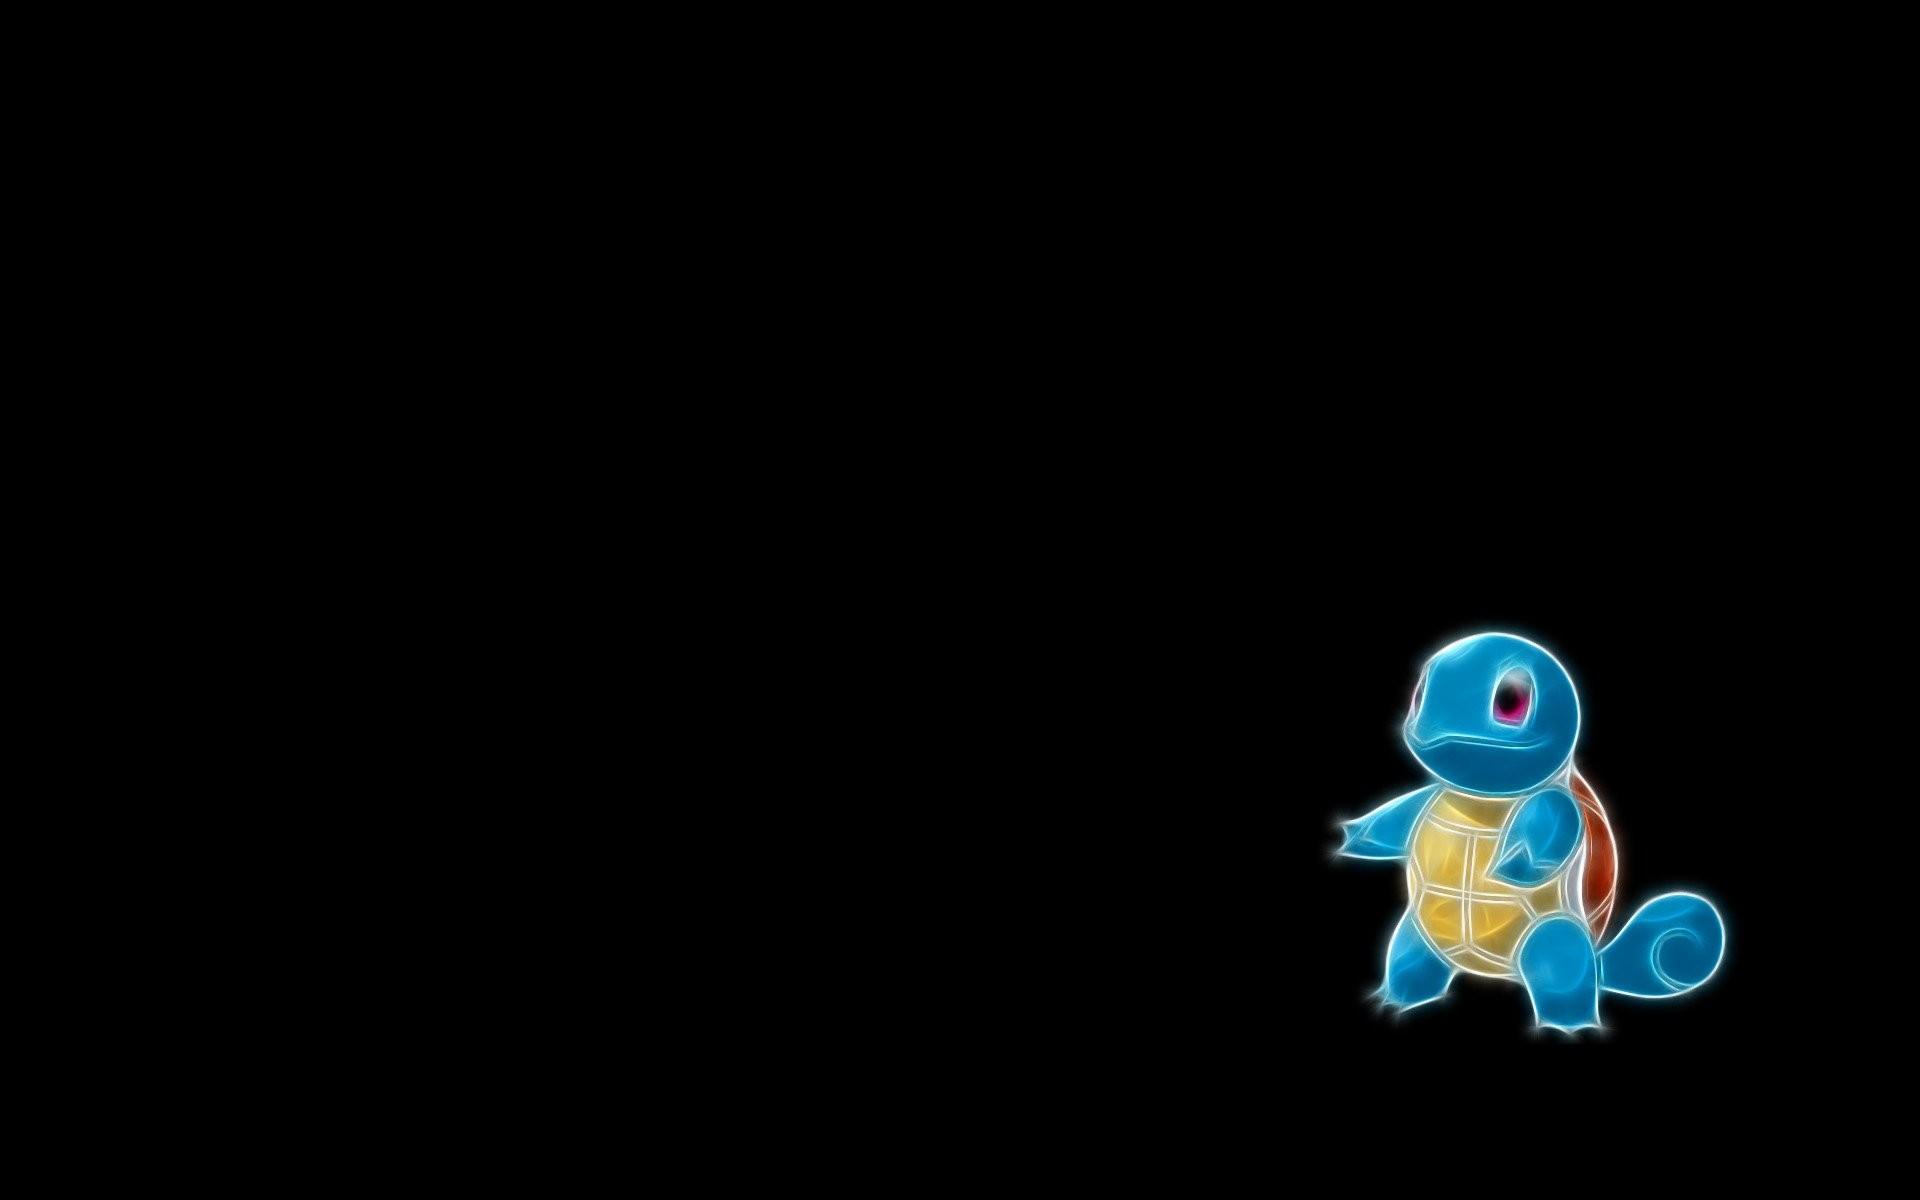 Anime РPok̩mon Squirtle (Pok̩mon) Starter Pokemon Water Pok̩mon Wallpaper